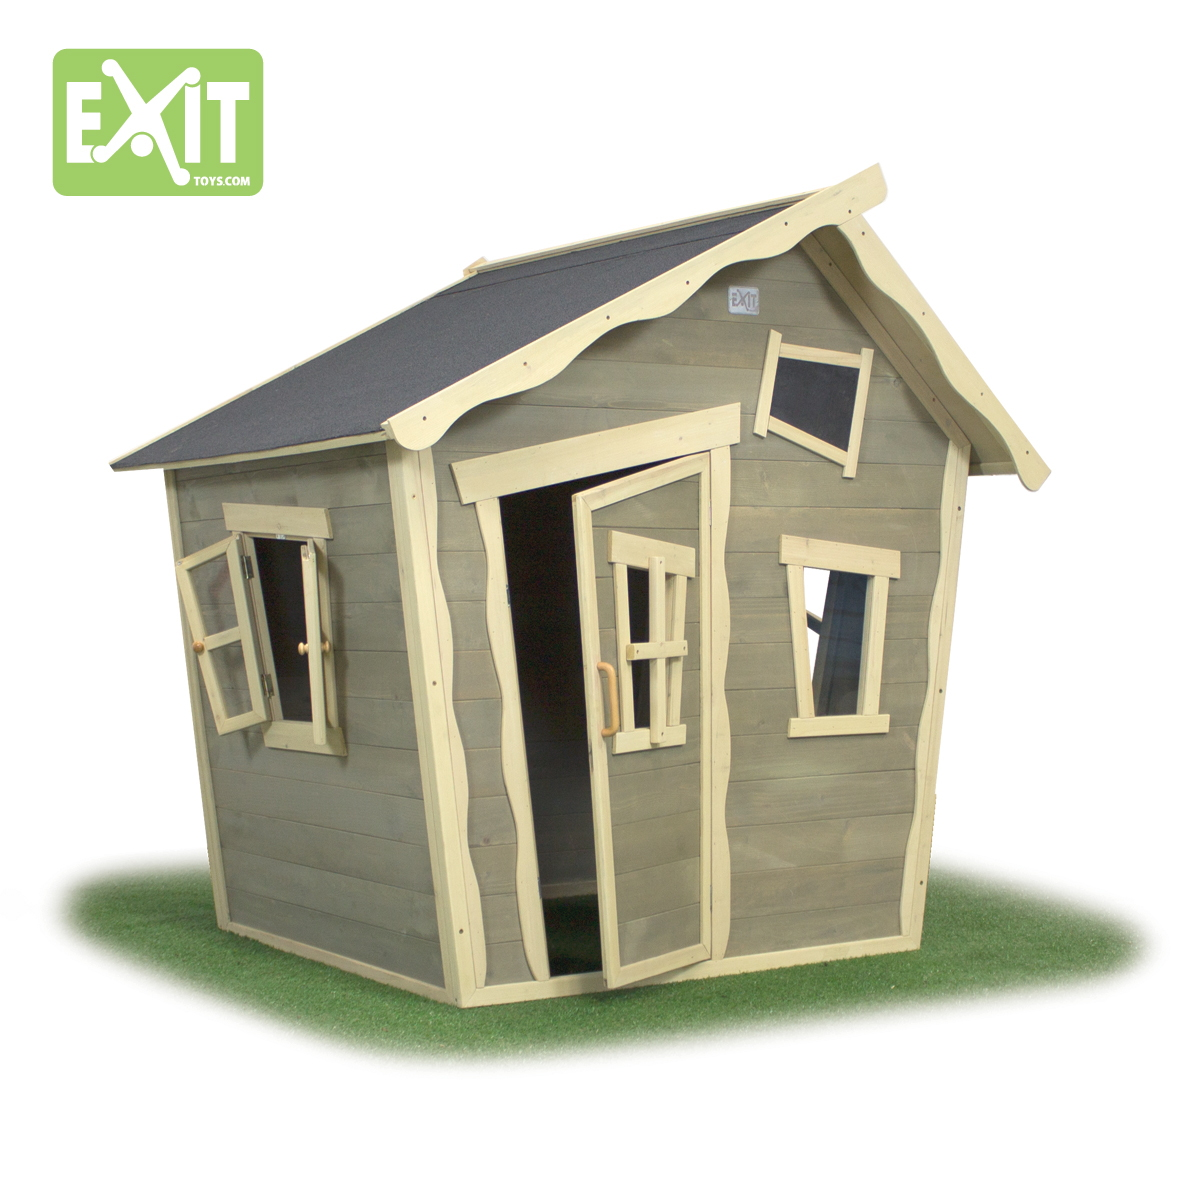 kinder spielhaus exit crooky 100 kinderspielhaus holzhaus kinderspielger te f r den garten. Black Bedroom Furniture Sets. Home Design Ideas